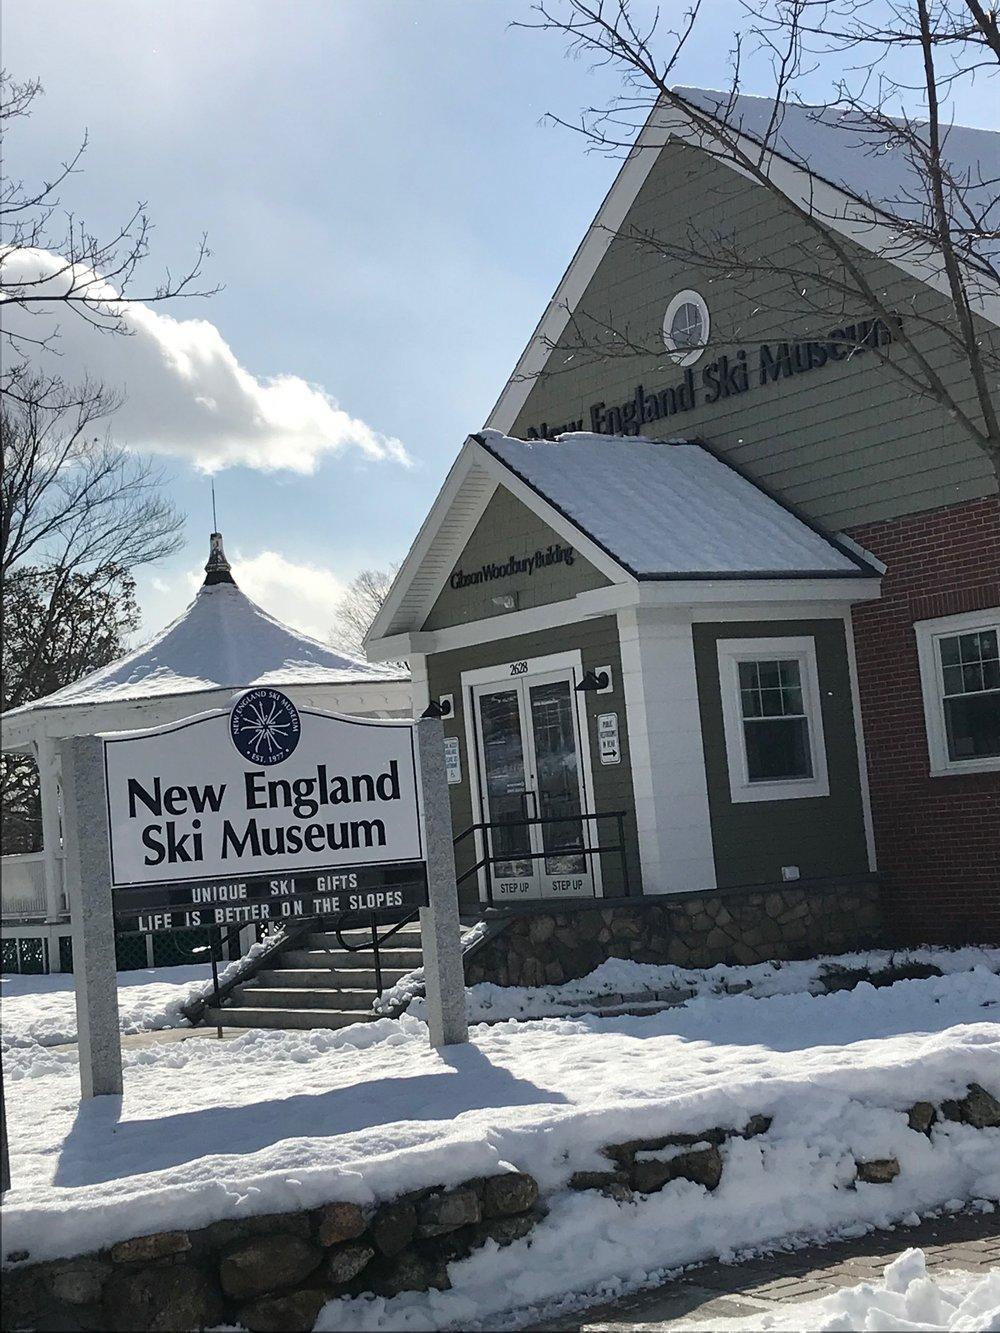 NE Ski Museum's North Conway location